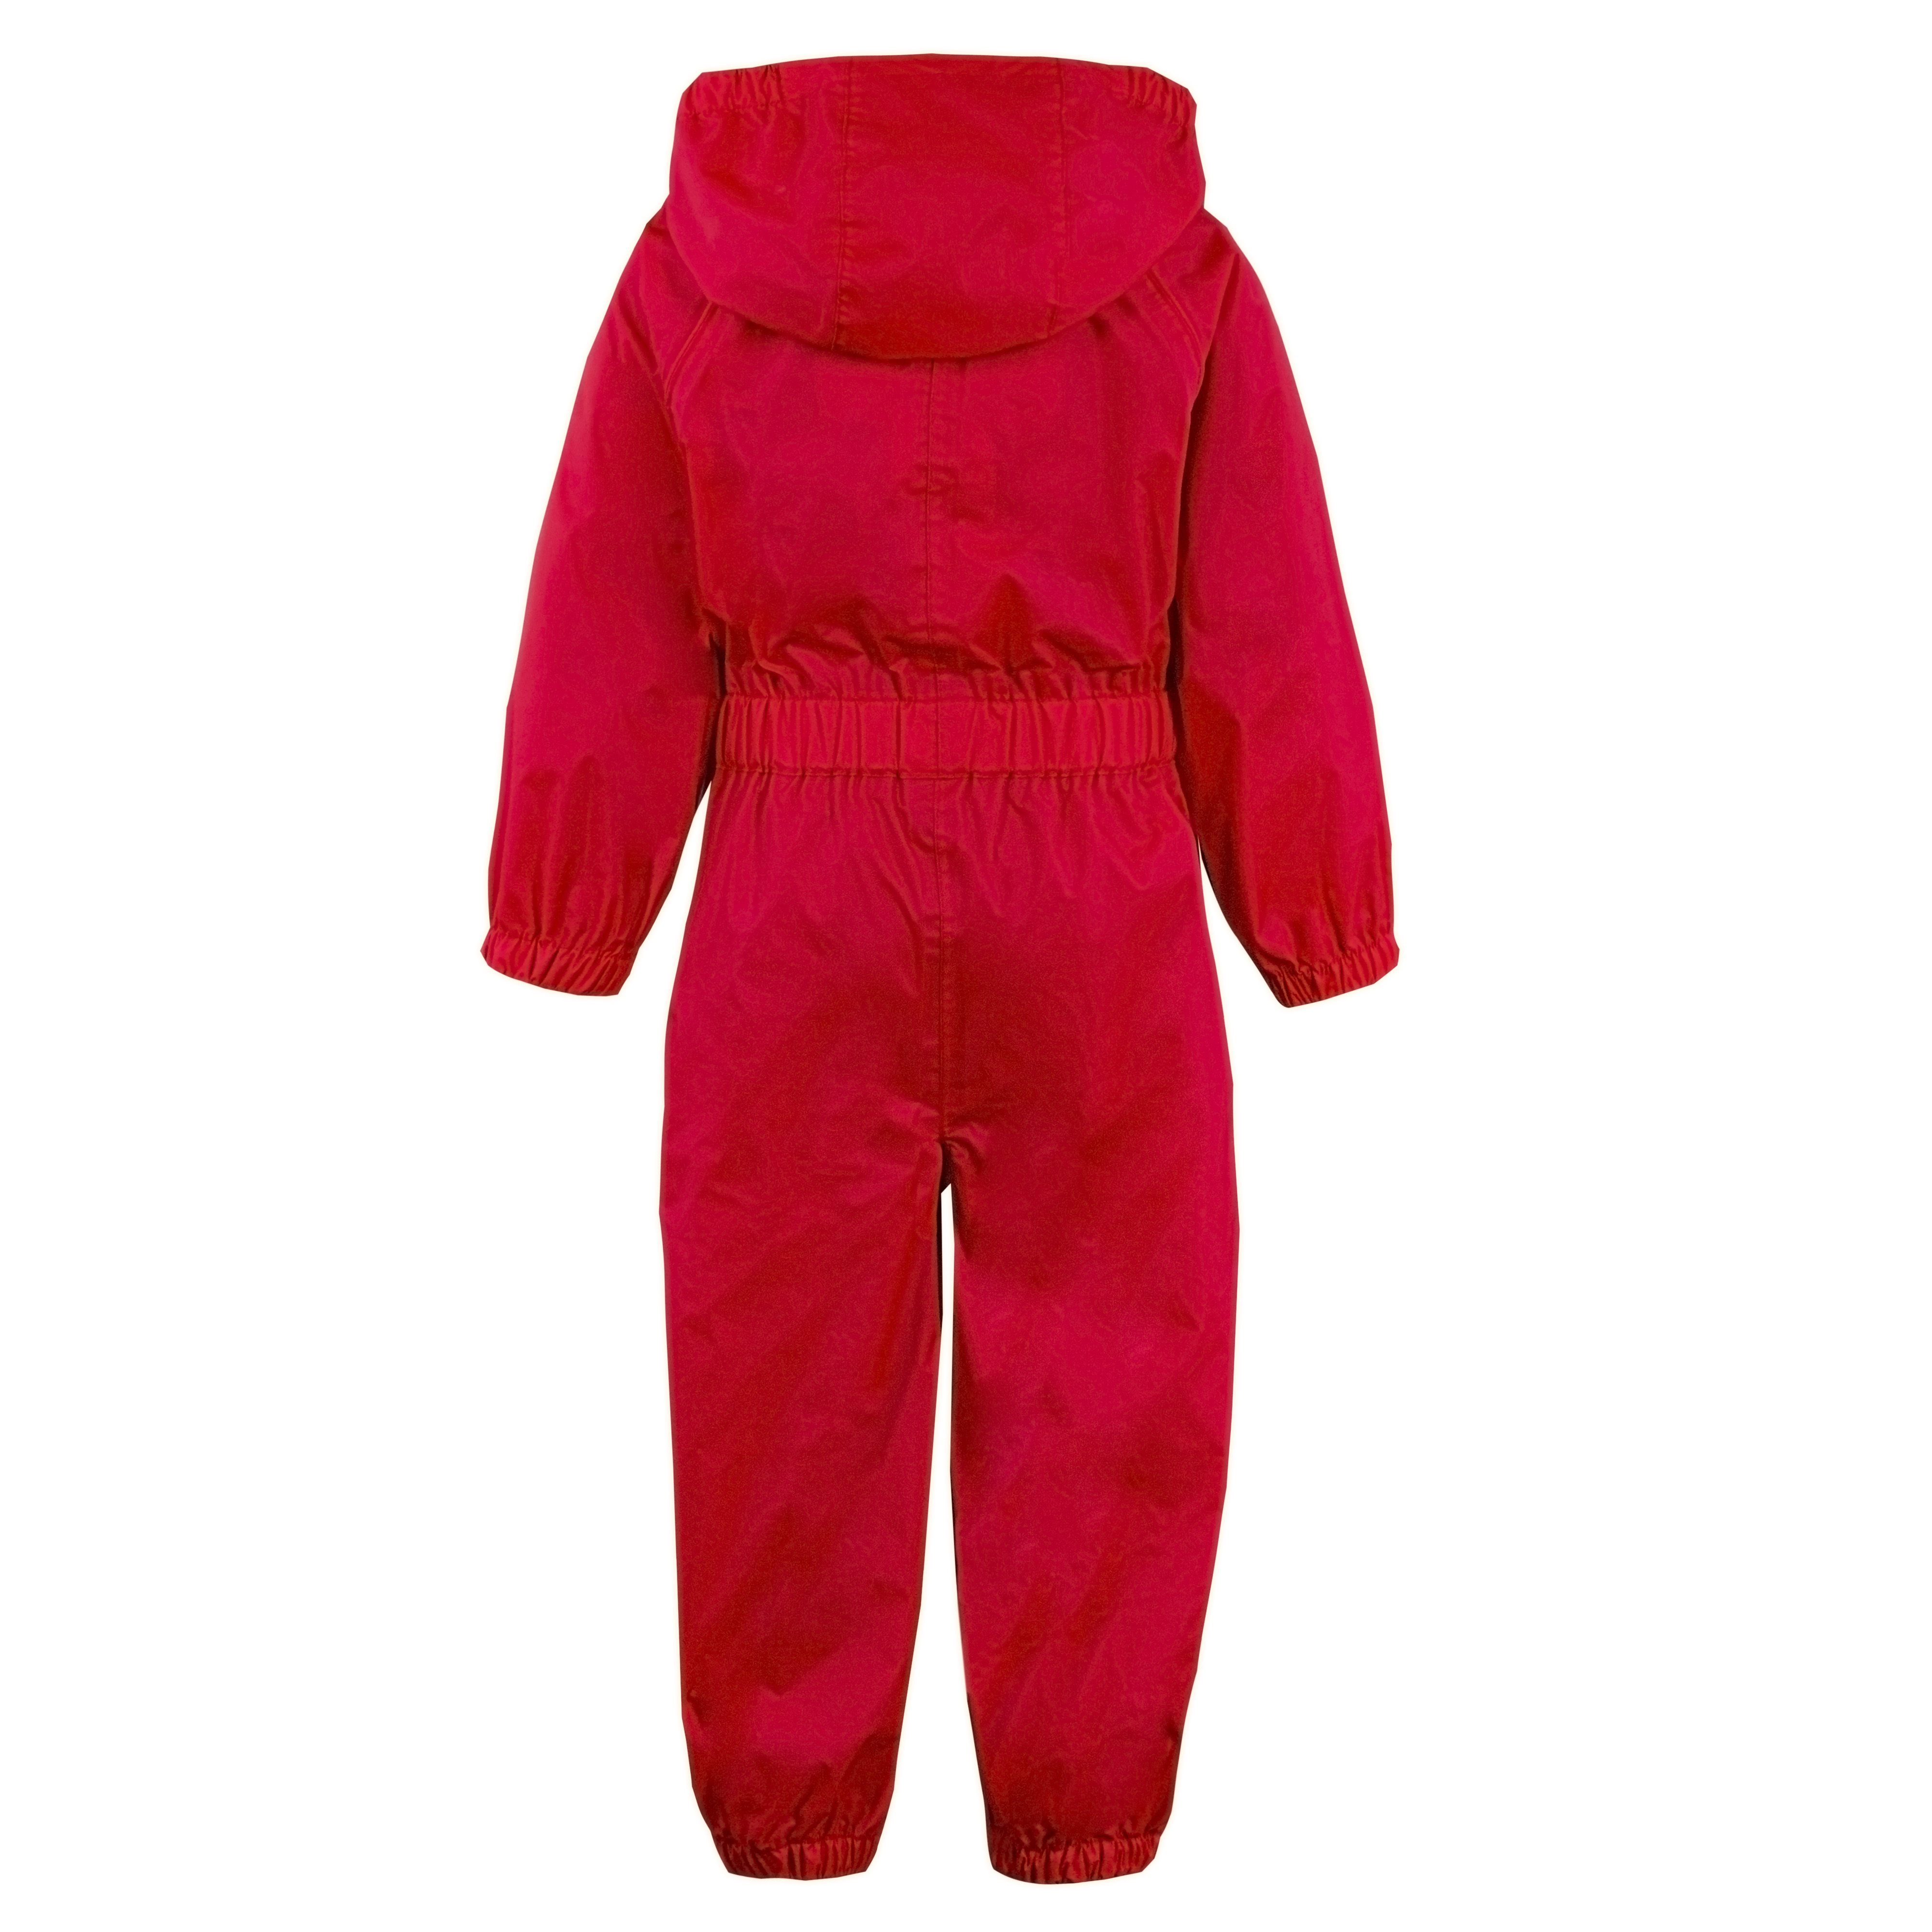 Boys-Kids-Waterproof-Tracksuit-Jacket-Coat-Trousers-Pants-Set-Outdoor-Camping thumbnail 9